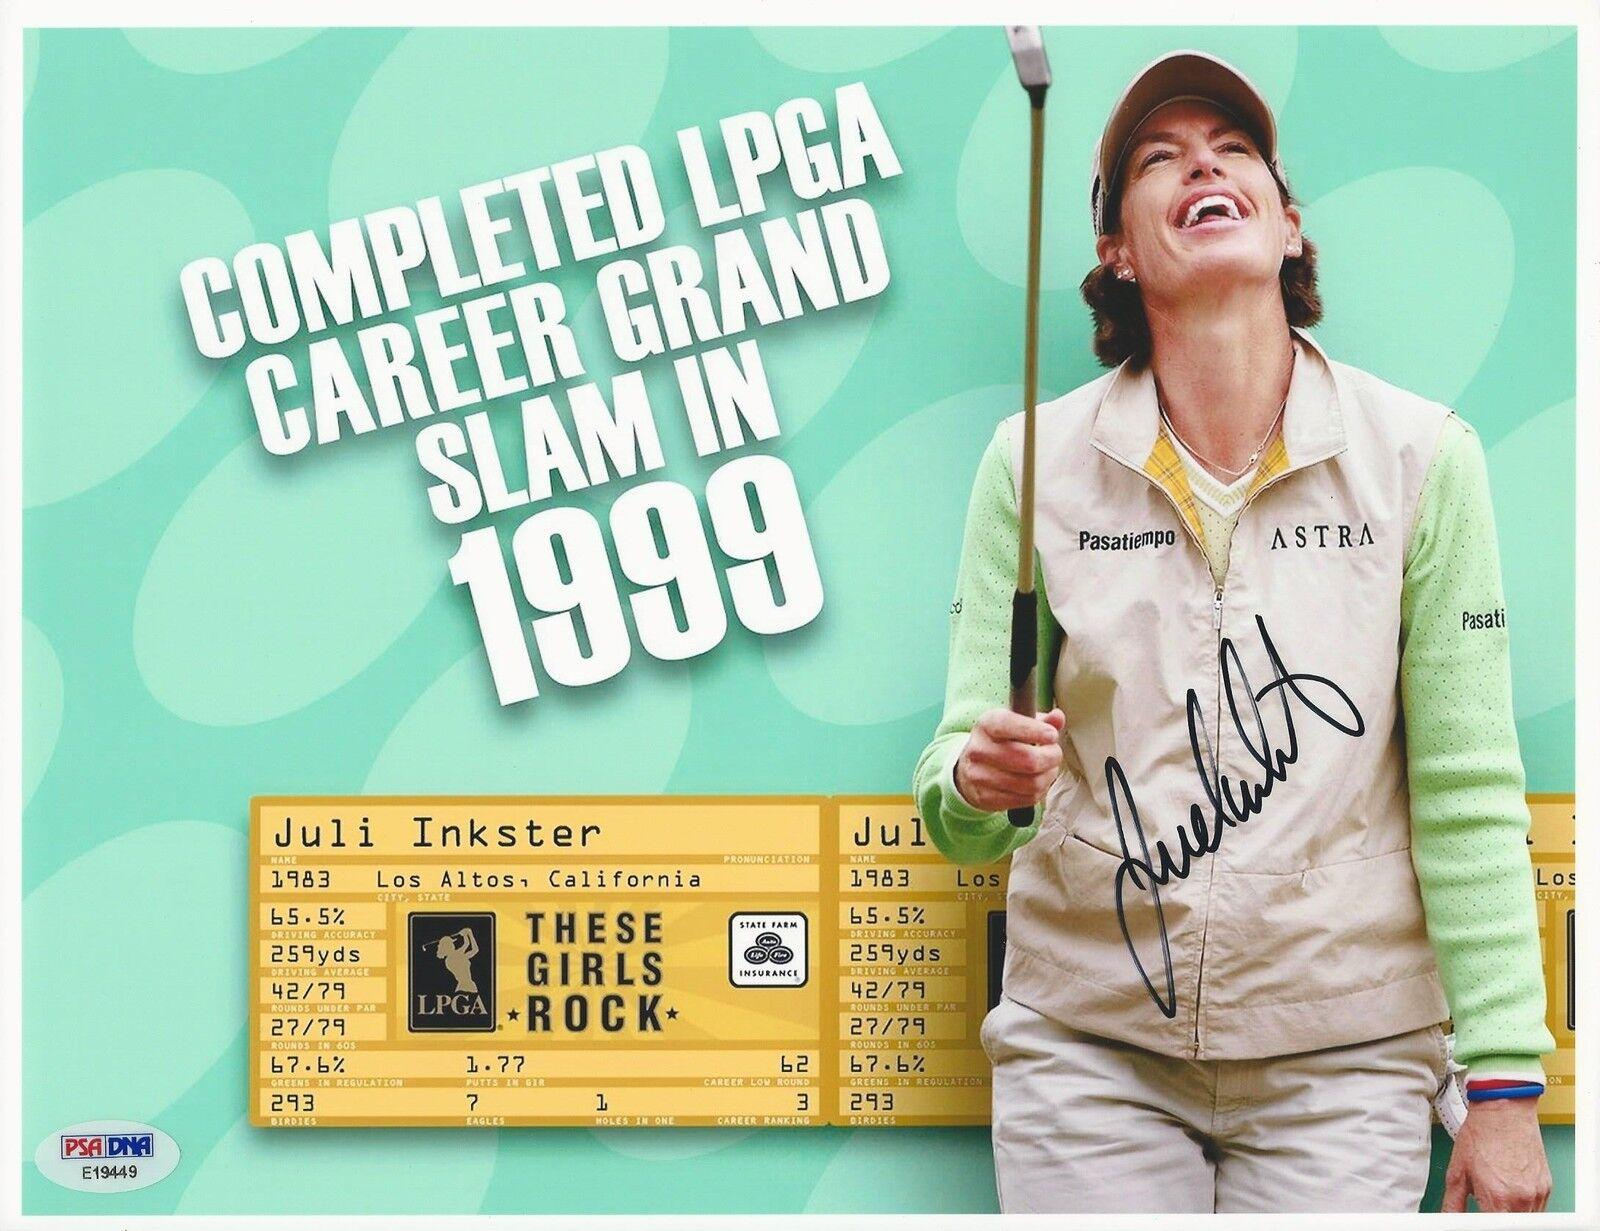 Juli Inkster LPGA Golfer signed 8x10 photo PSA/DNA #E19449